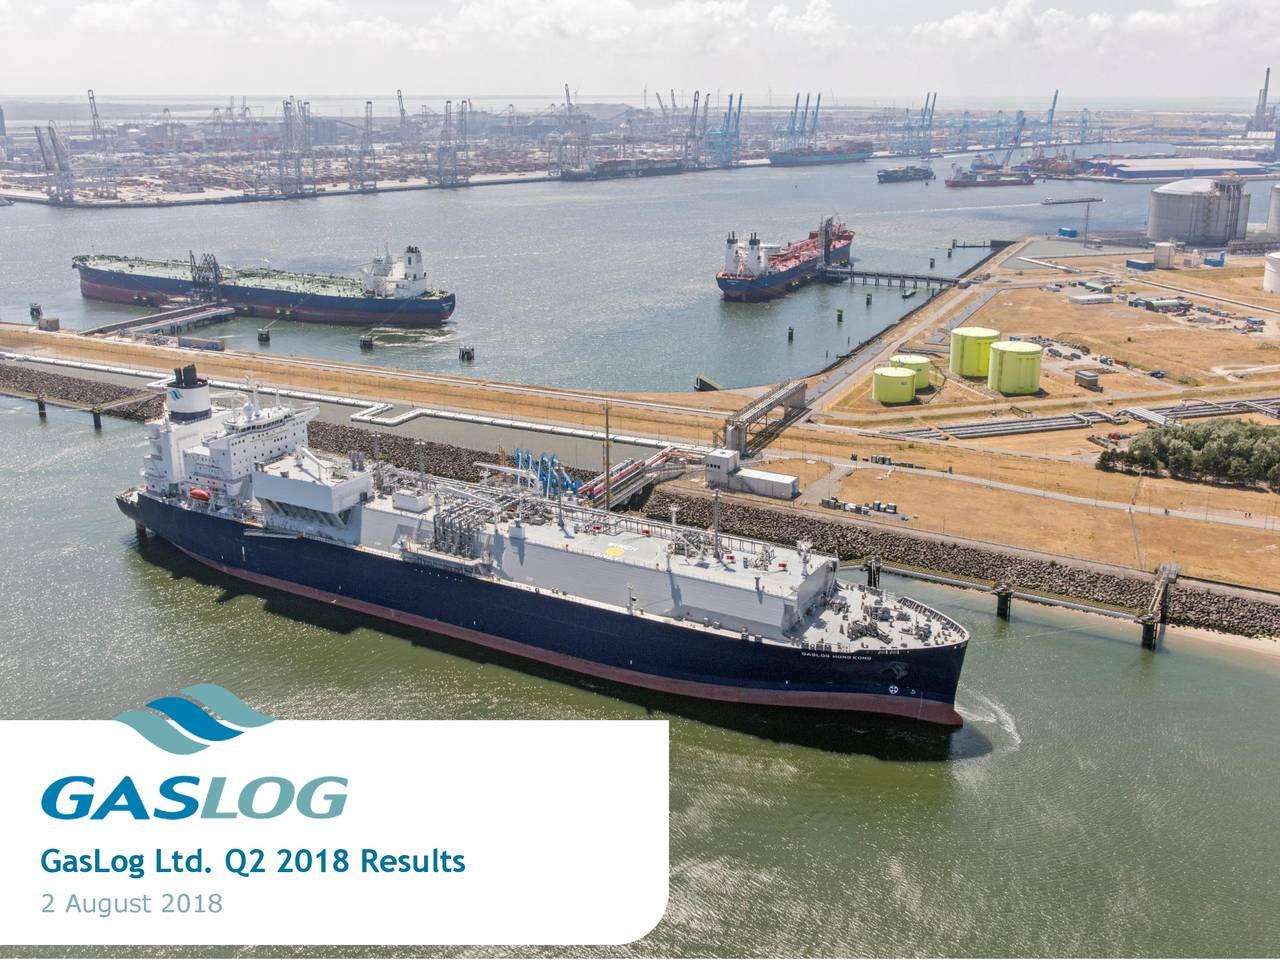 GasLog Ltd. Q2 2018 Results